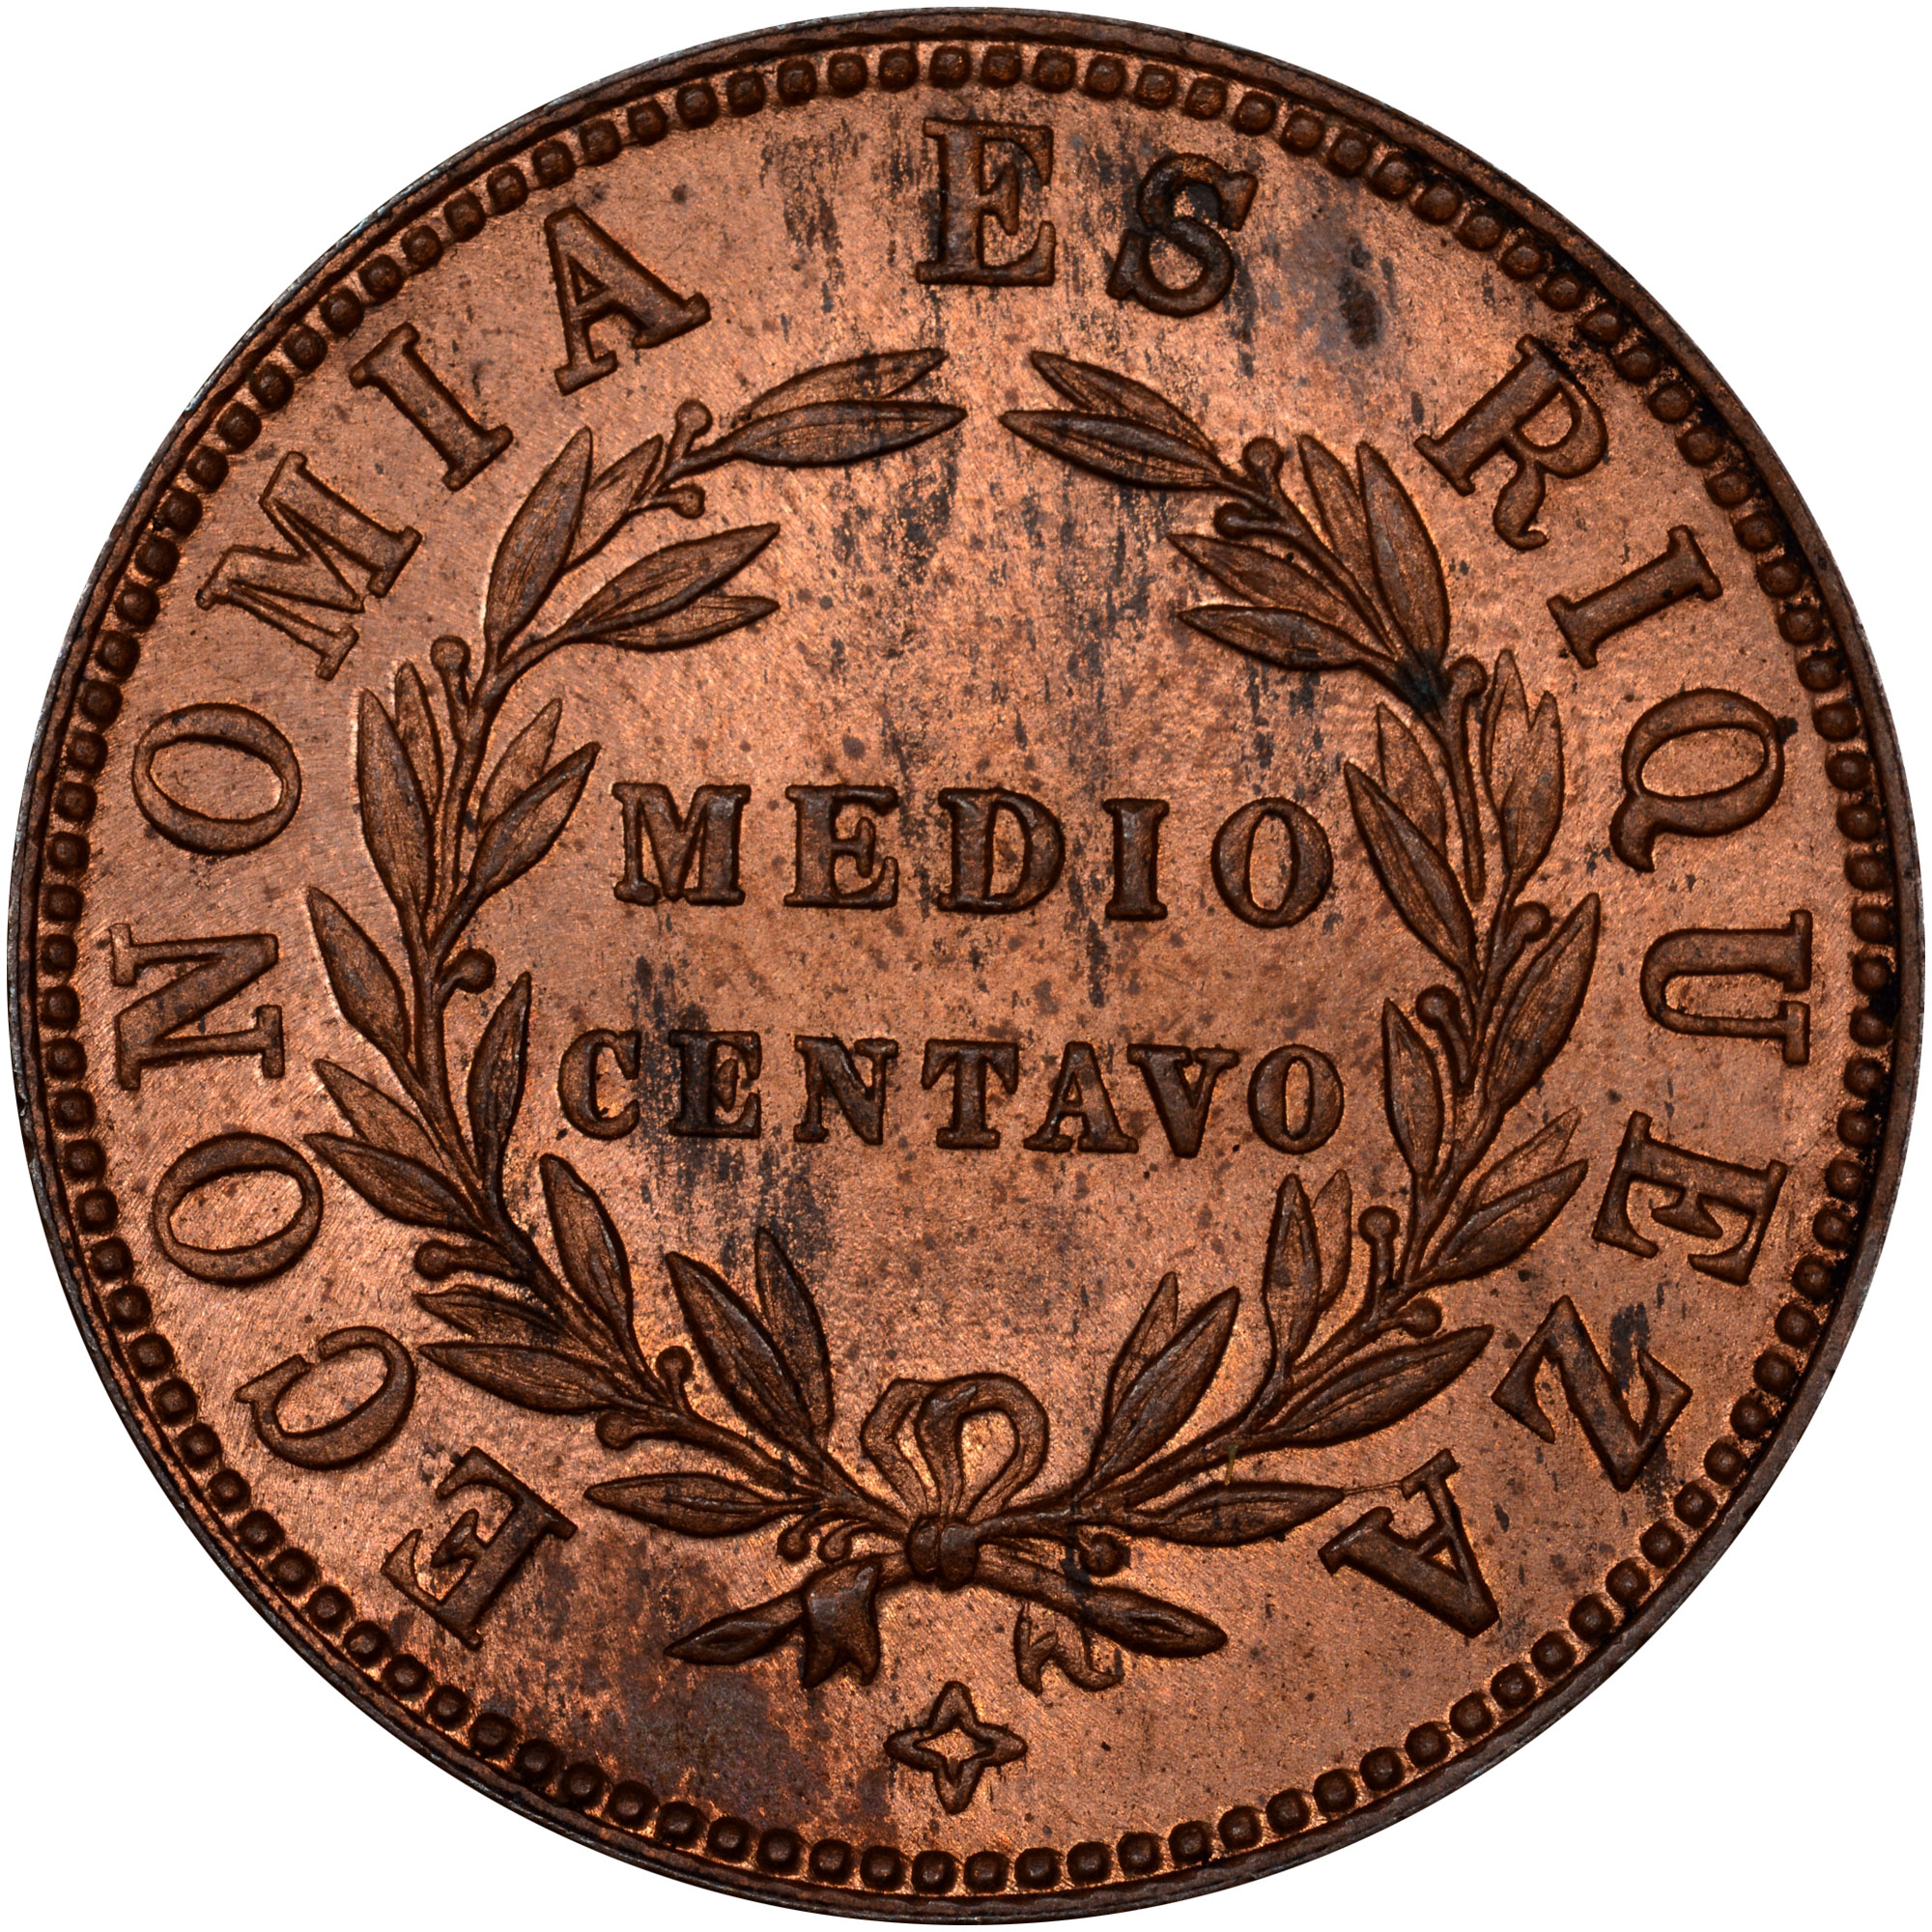 1853 Chile 1/2 Centavo reverse